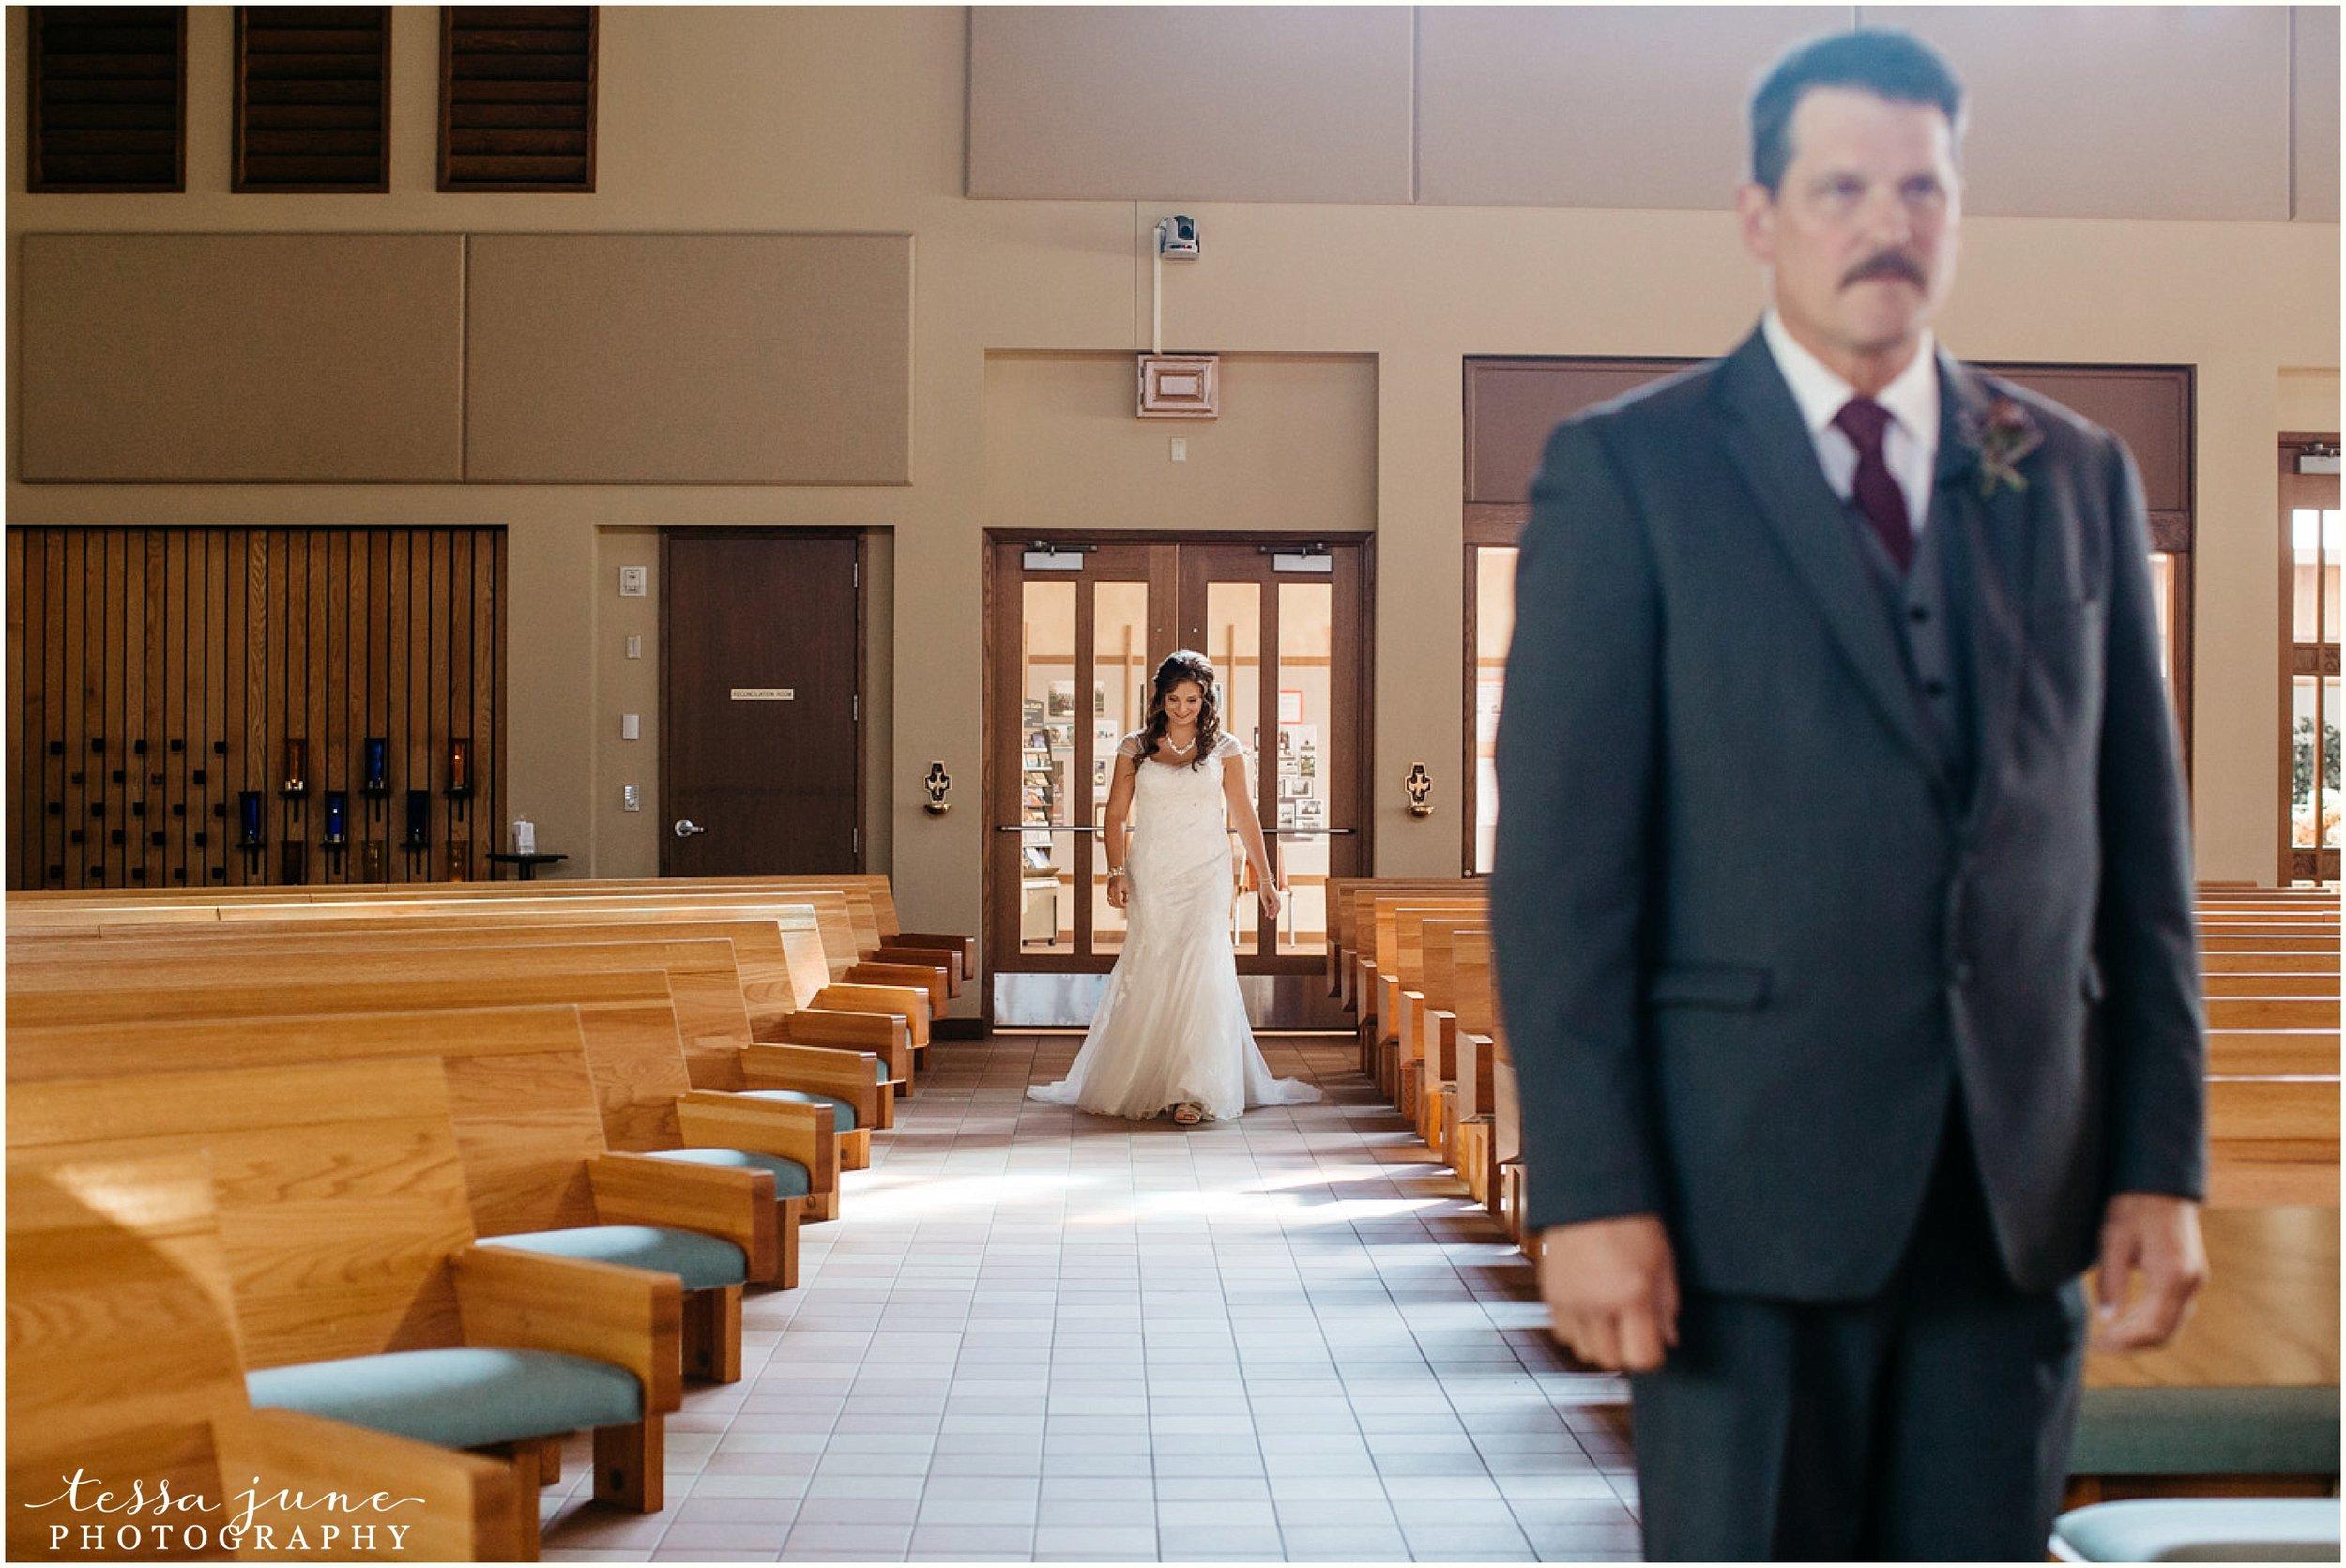 bohemian-minnesota-wedding-mismatched-bridesmaid-dresses-waterfall-st-cloud-tessa-june-photography-33.jpg